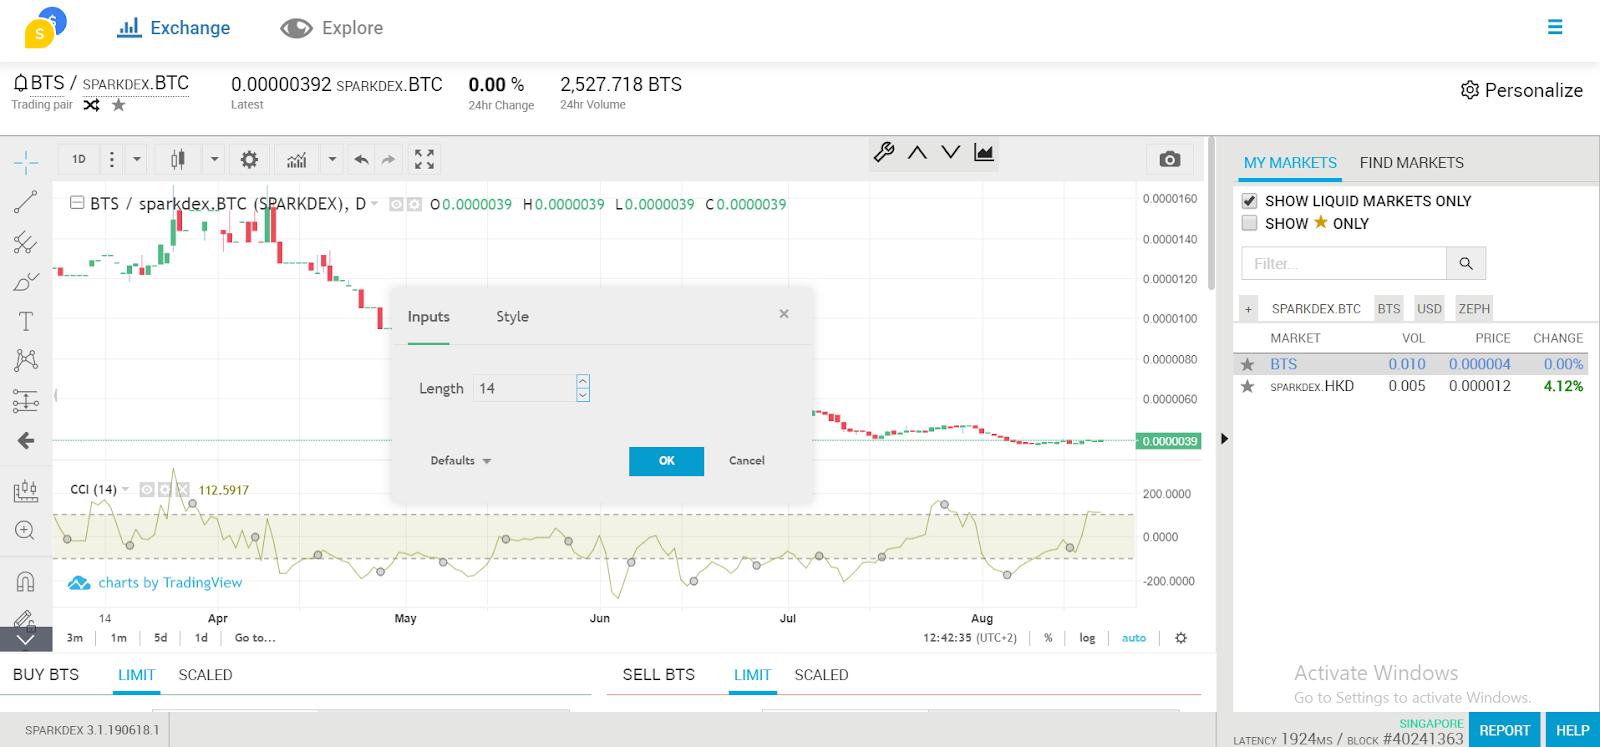 CCI Indicator on Sparkdex